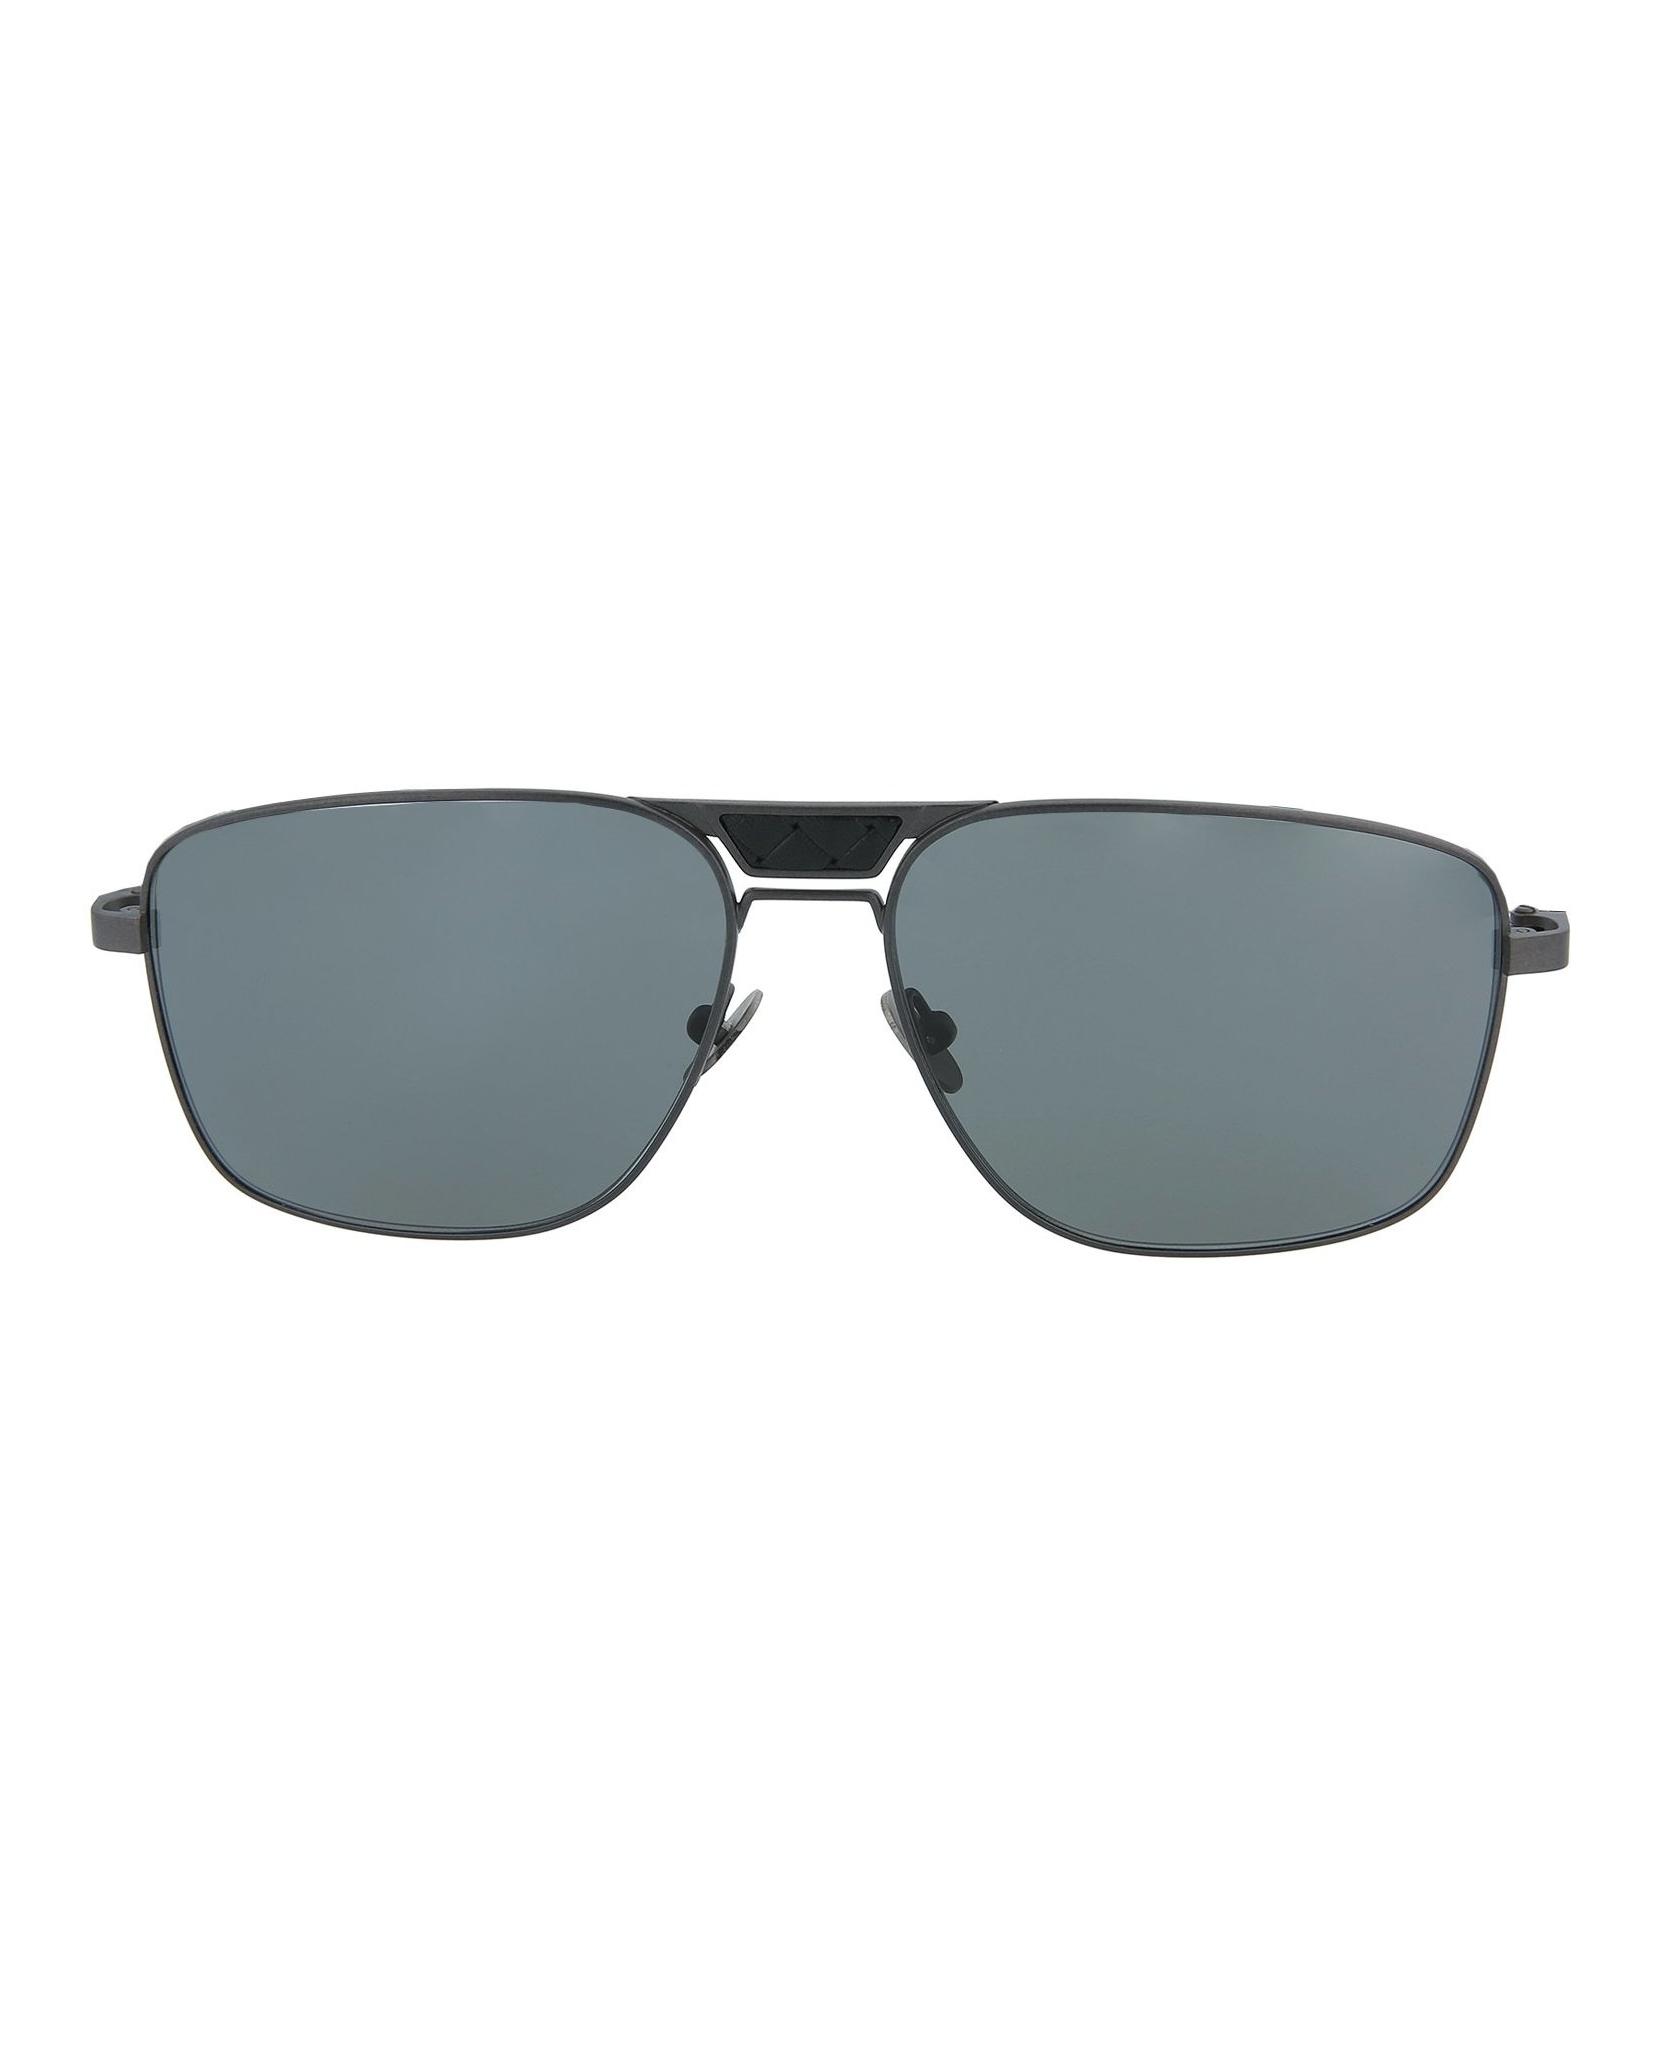 214adeee225c0 Bottega Veneta Mens Square Rectangle Sunglasses BV0052S-30000294-003 ...